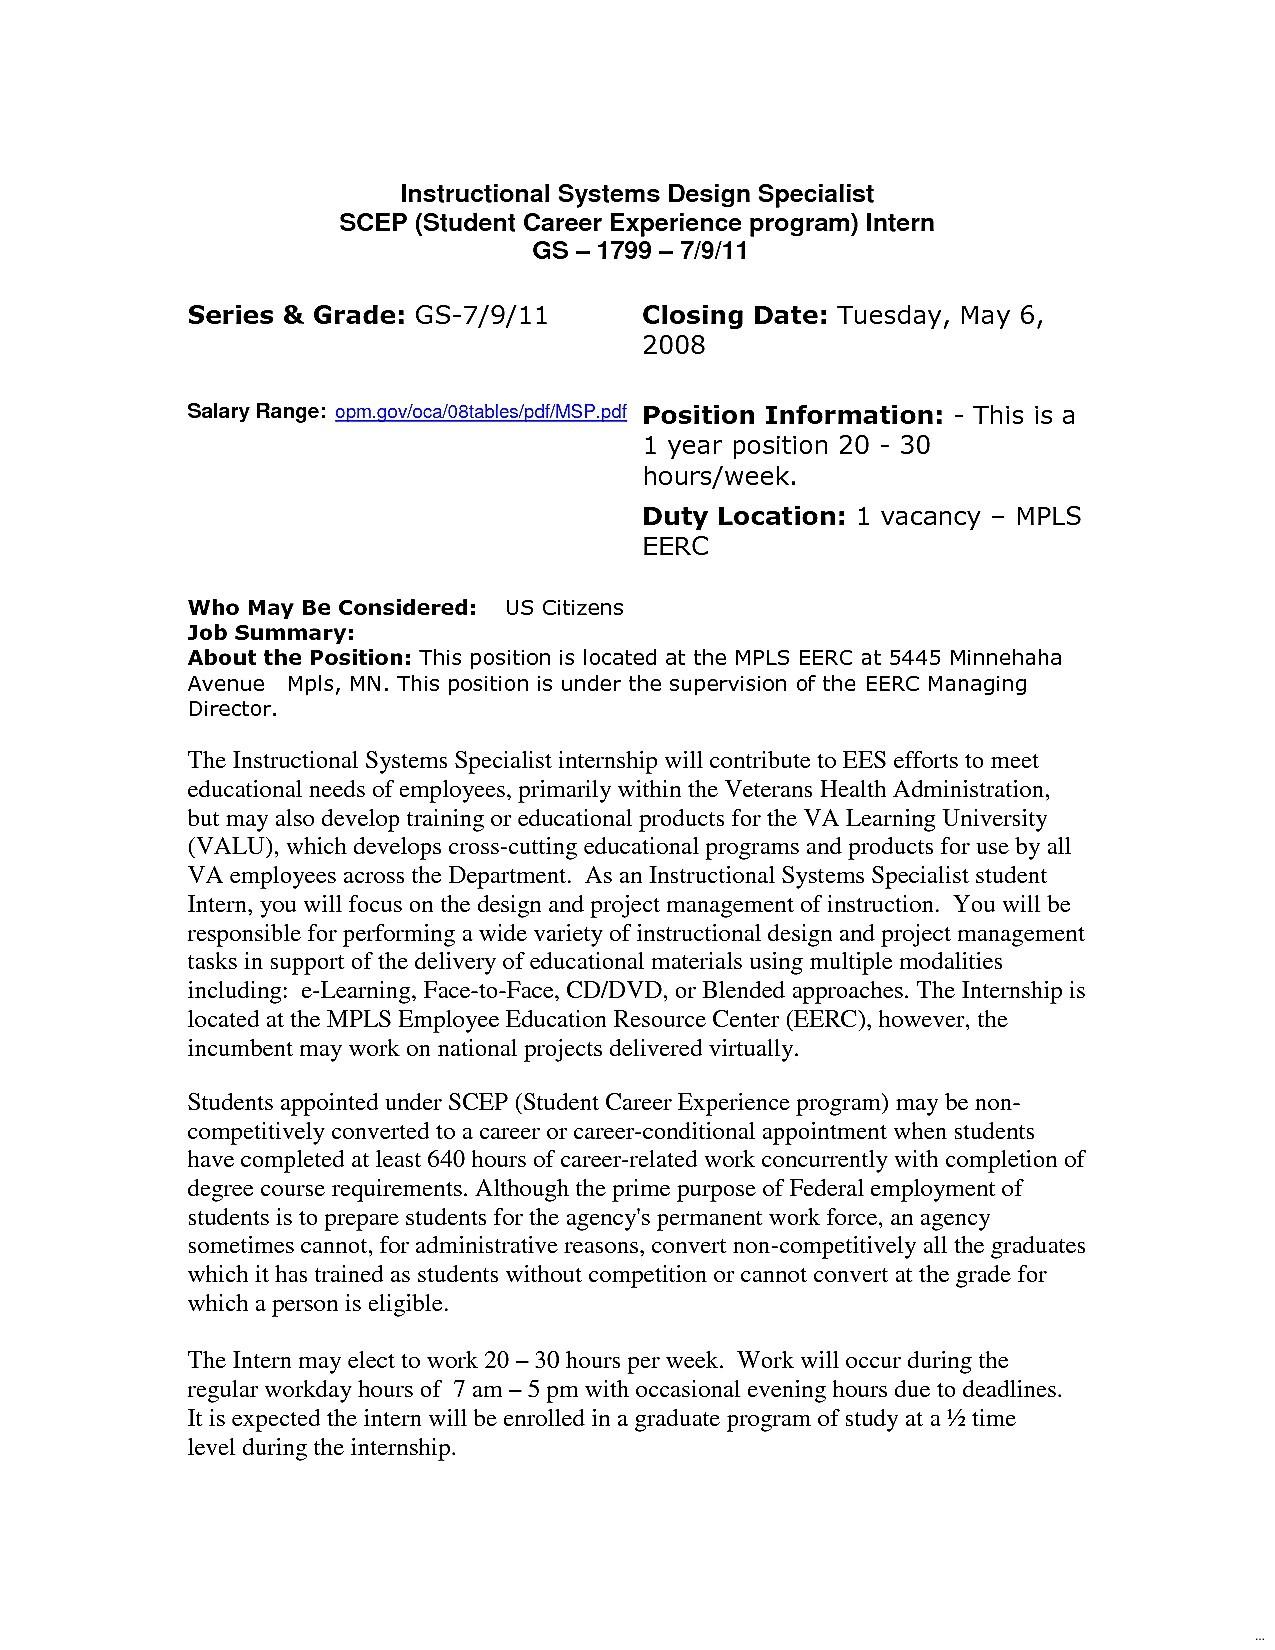 Usa Jobs Cover Letter Template - Usa Jobs Cover Letter Sample Inspirationa New Resume Maker Free